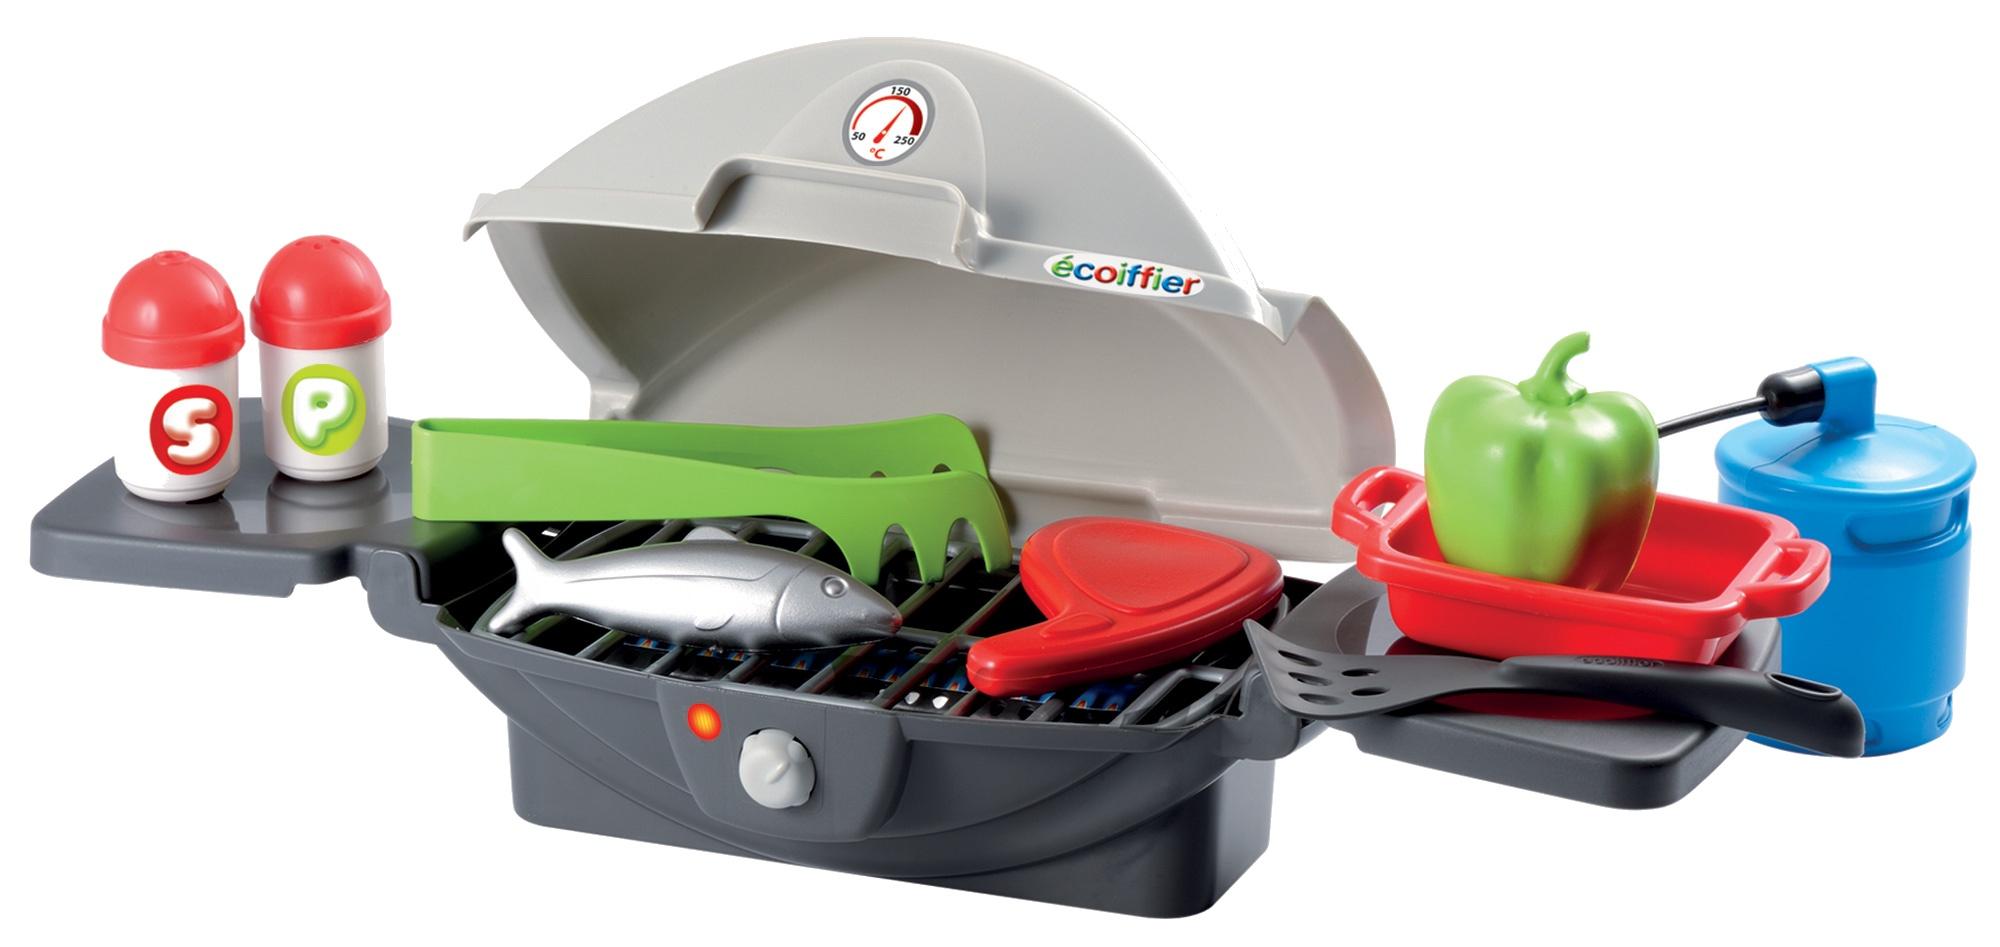 écoiffier spielzeug grill 60 x 40 x 30 cm 12 blatt - internet-toys